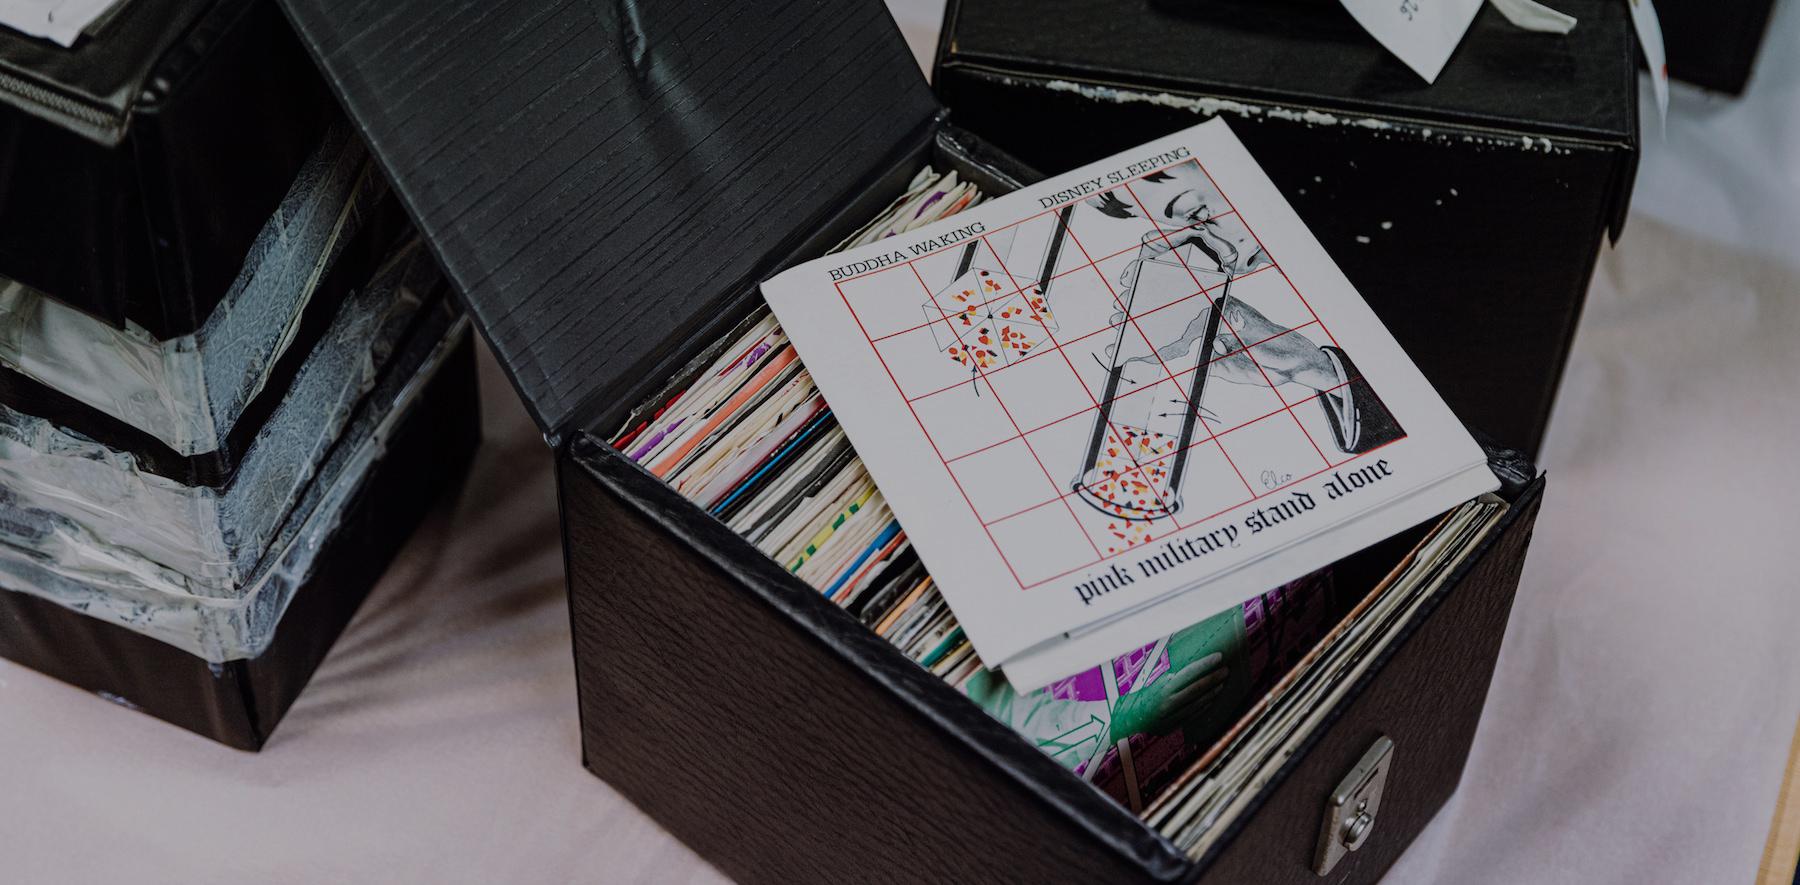 Curiosities – Au coeur de la collection de disques de Tony Wilson